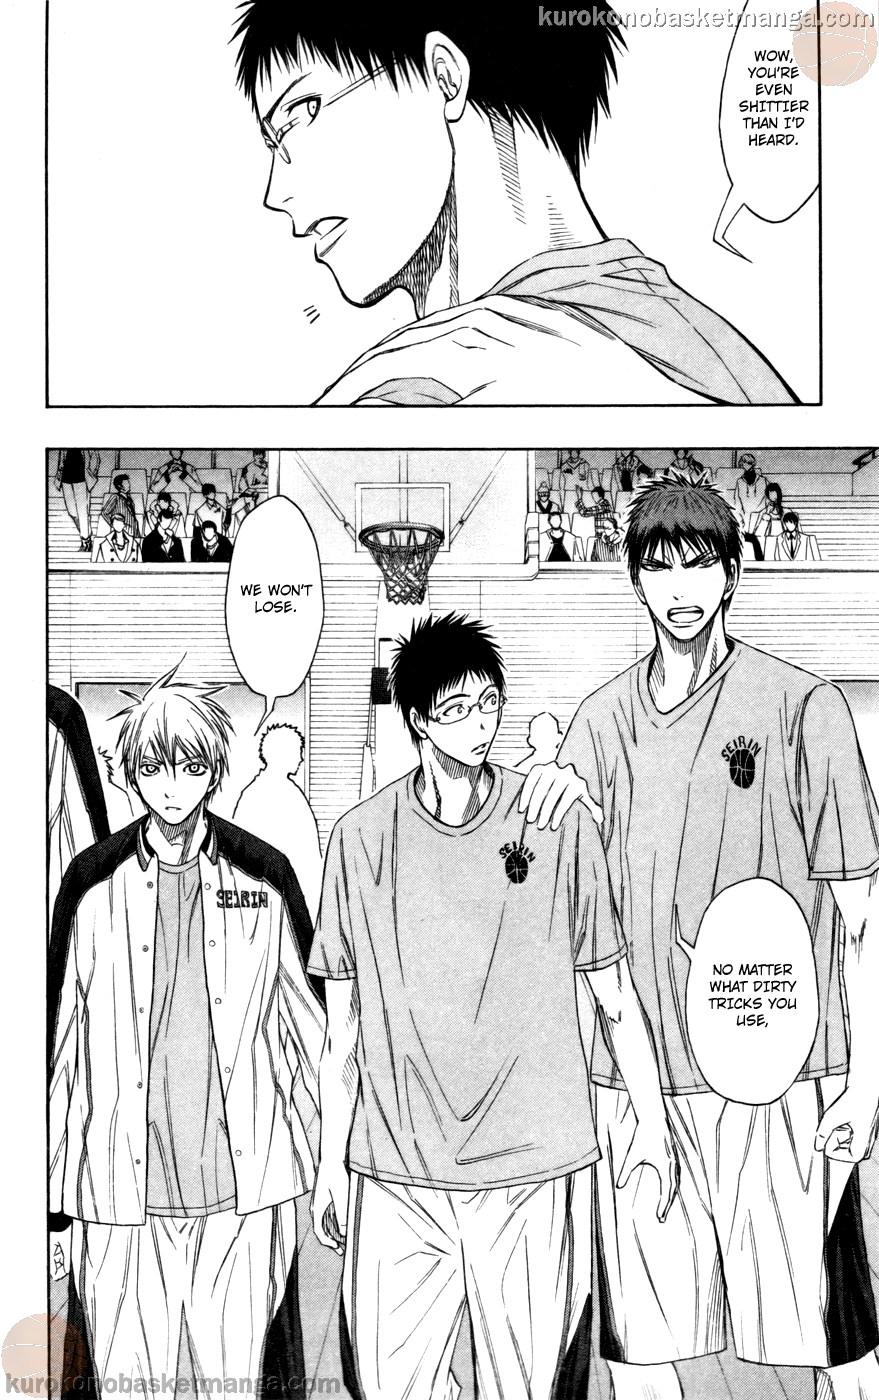 Kuroko no Basket Manga Chapter 100 - Image 14